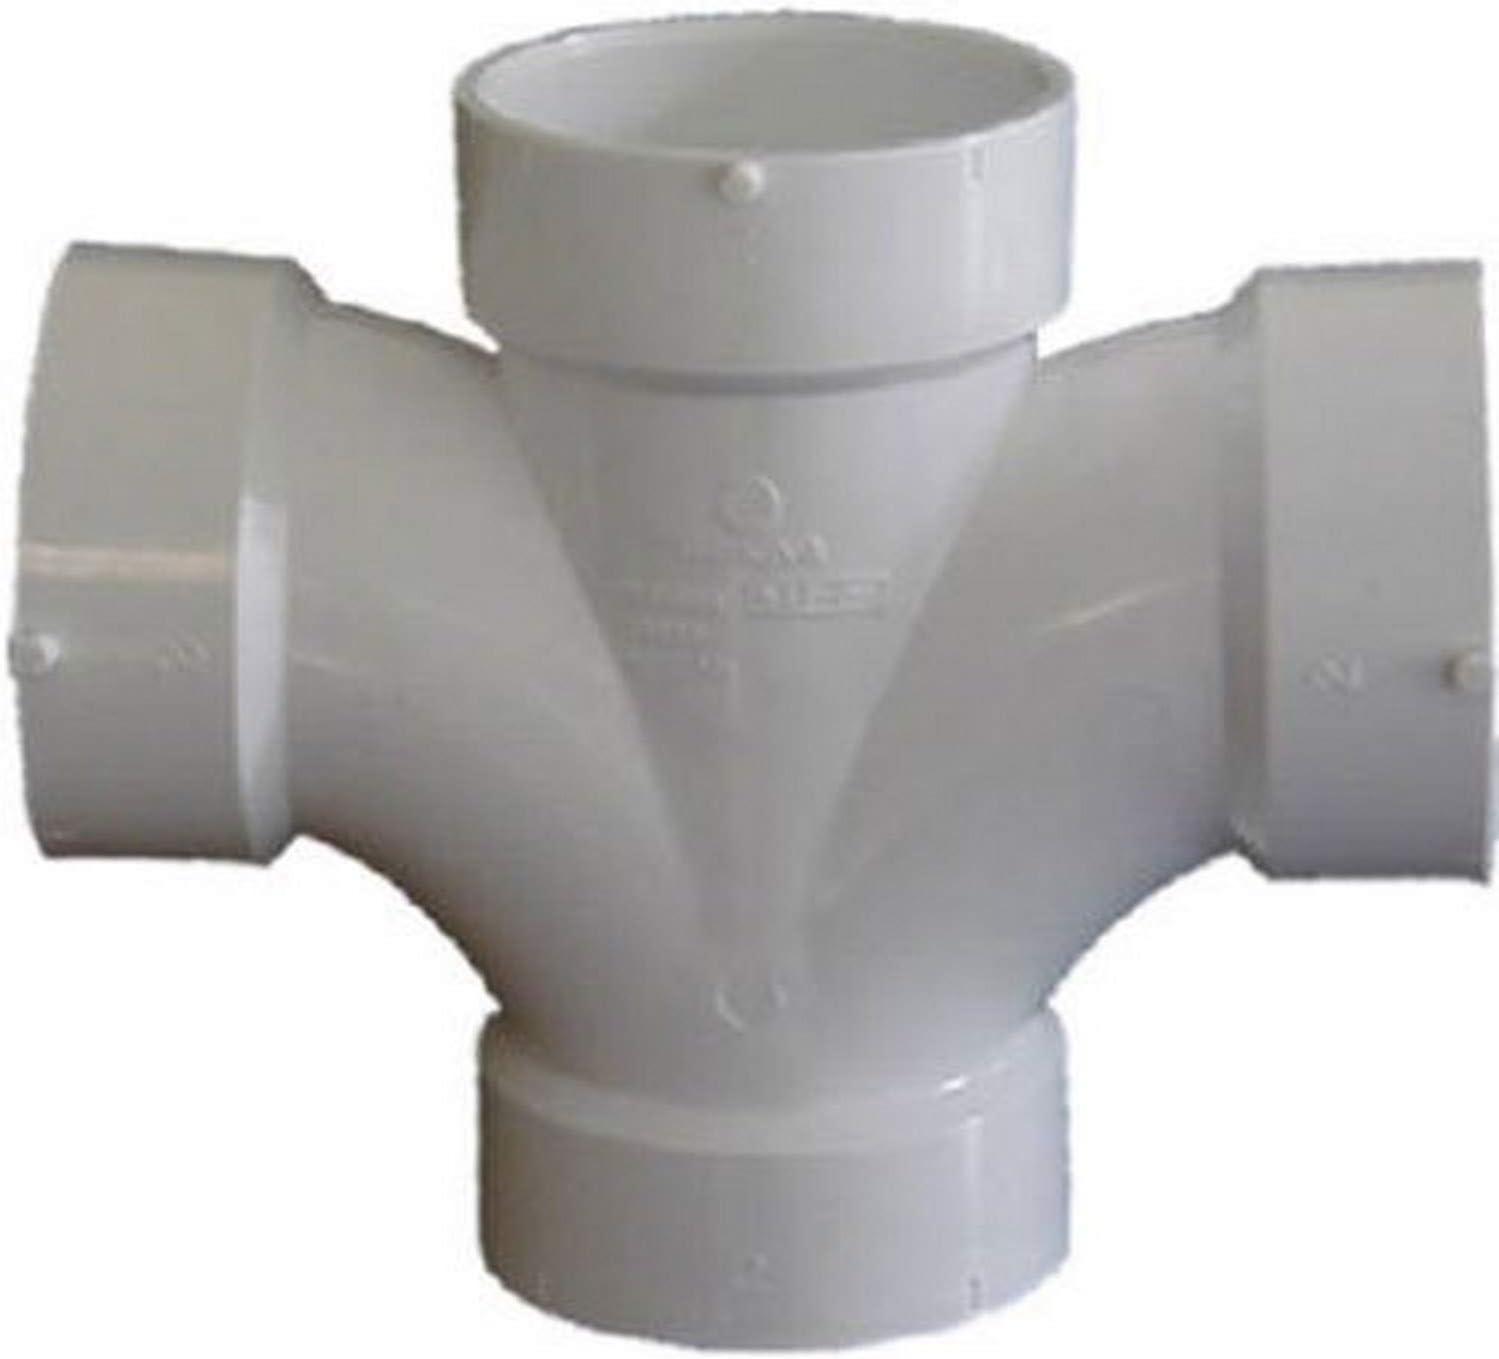 Genova Save money Products 73540 Double Sanitary 4